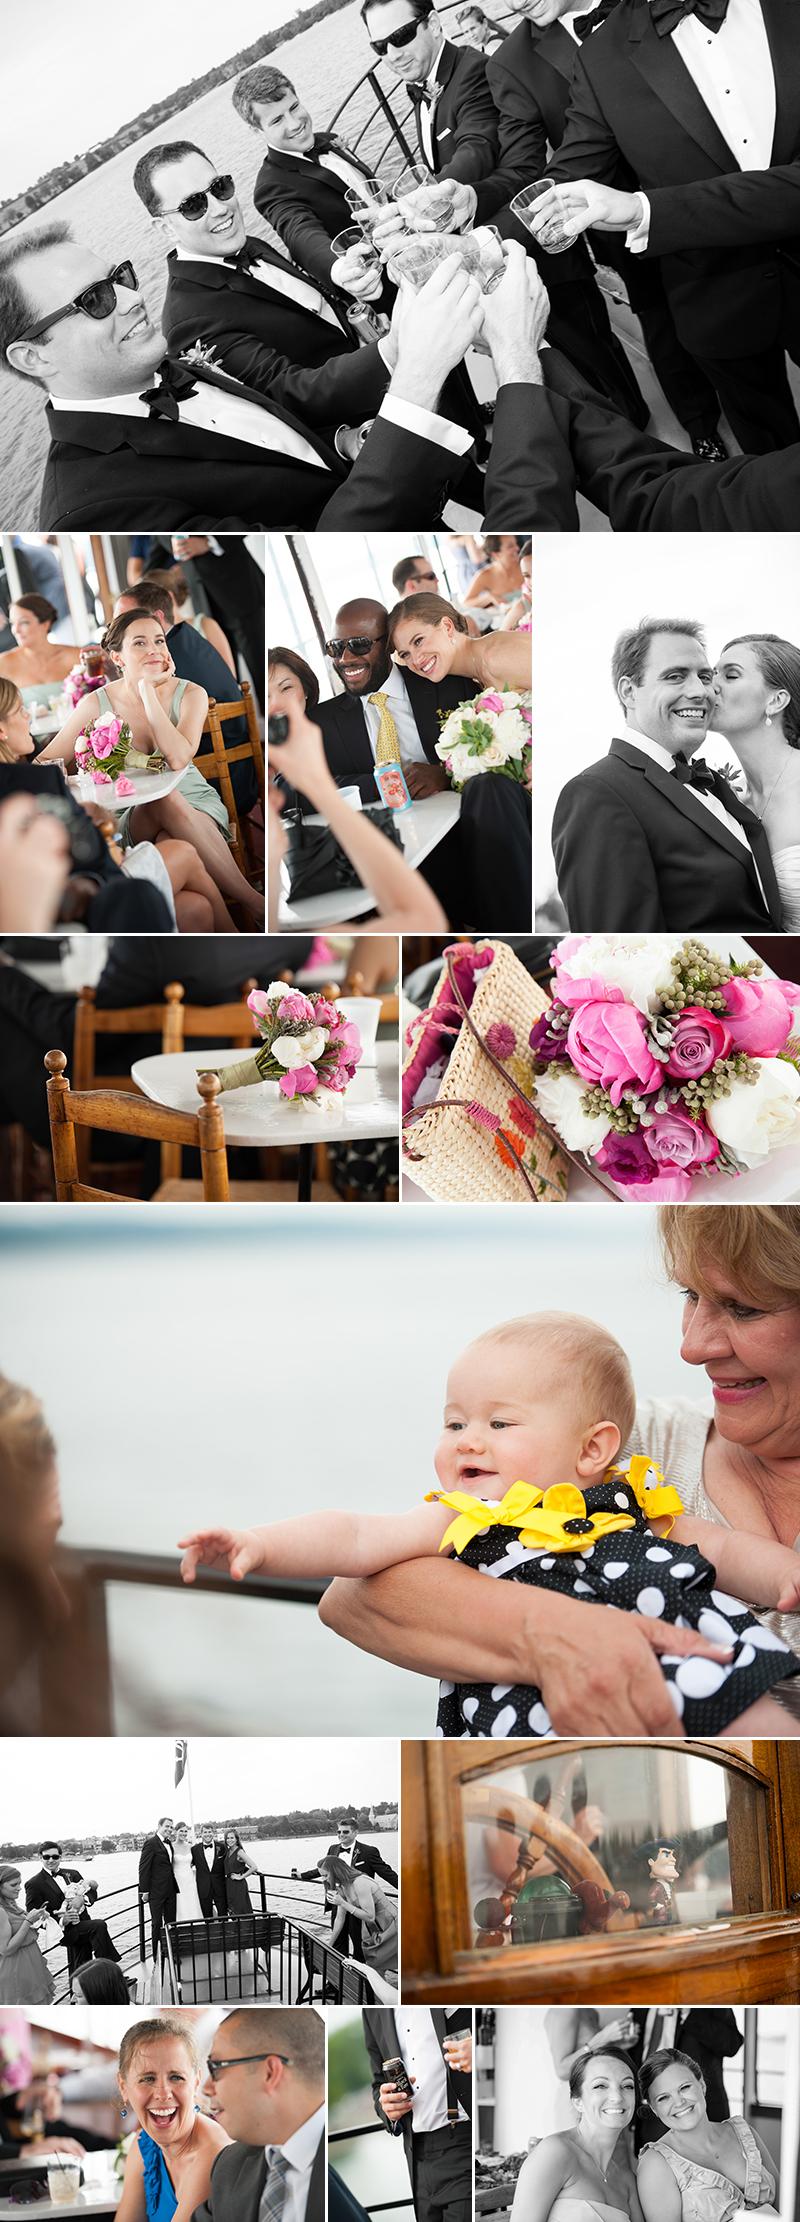 Blog Collage-1395770095522